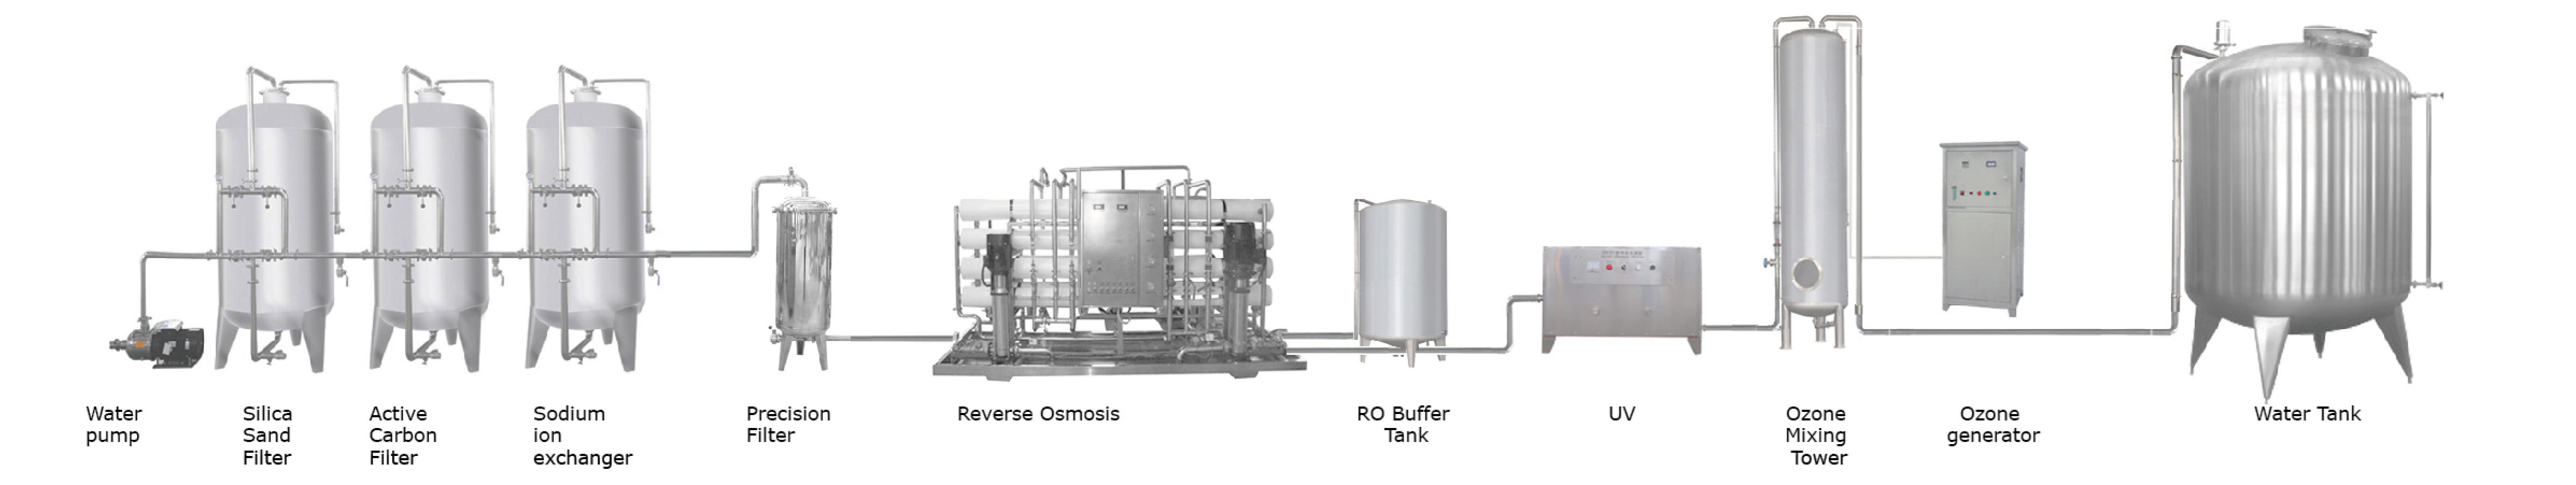 Pure Water Treatment Plants.jpg